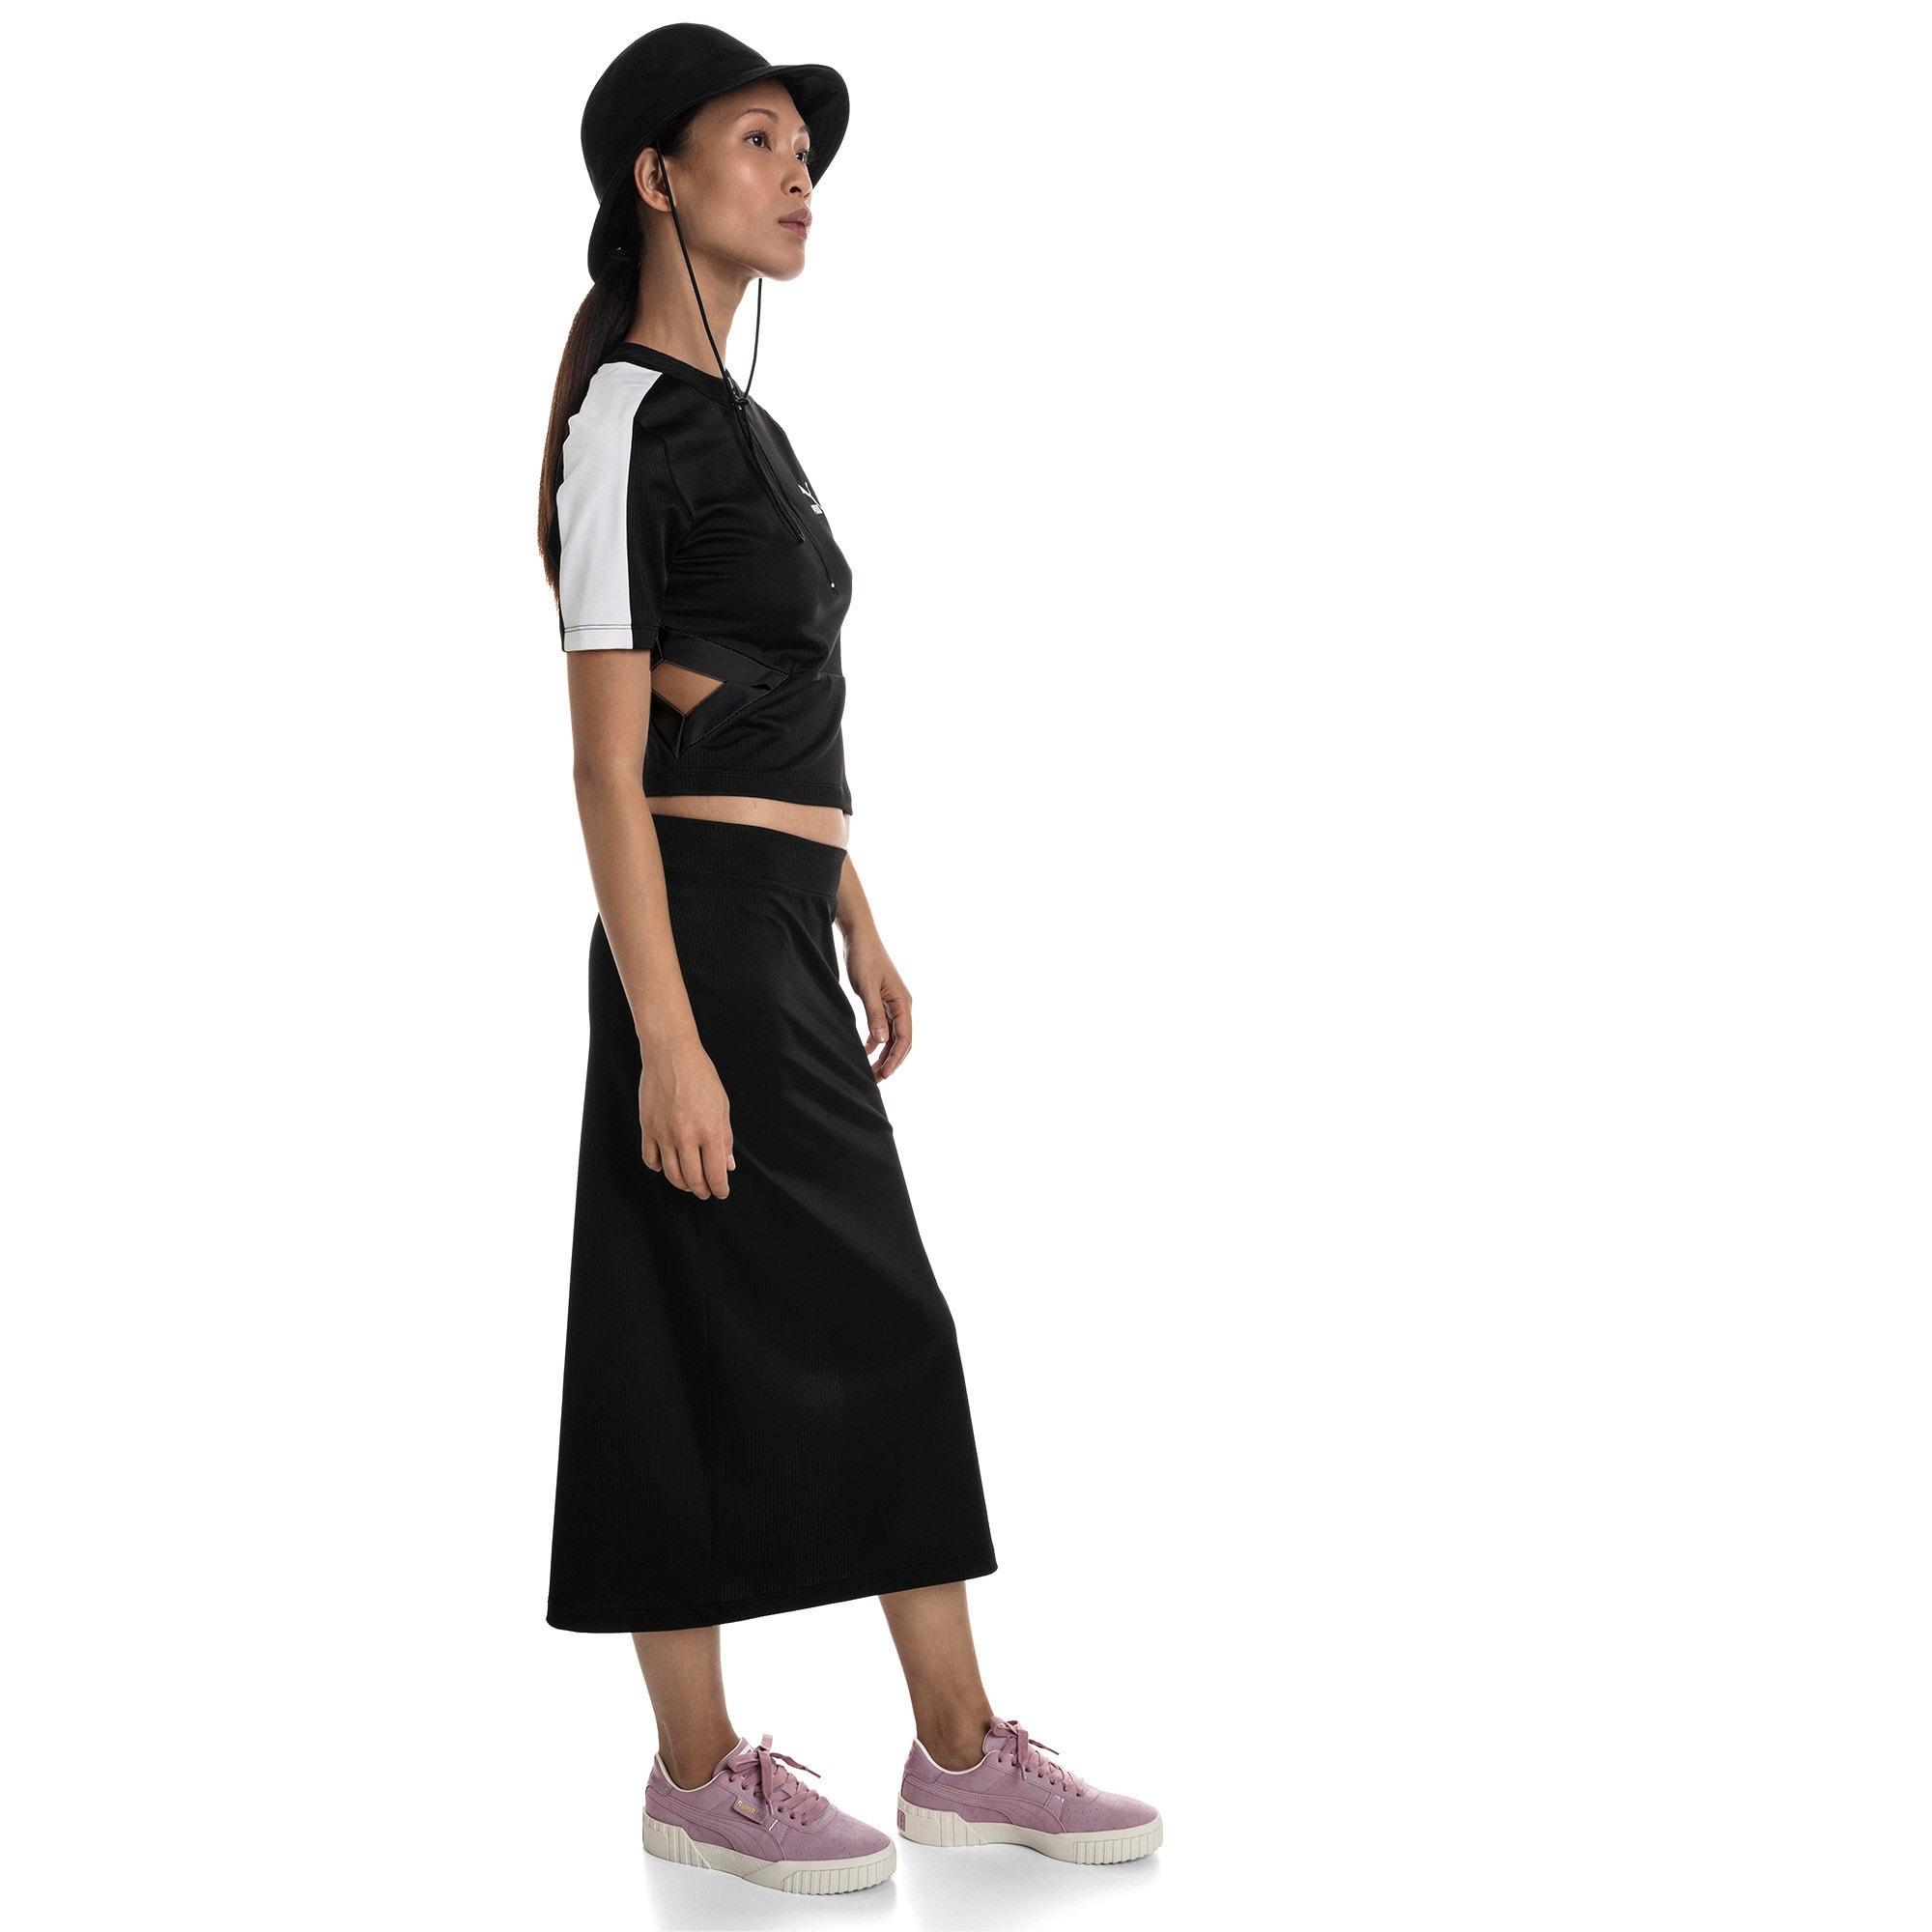 Thumbnail 3 of Classics Women's Skirt, Puma Black, medium